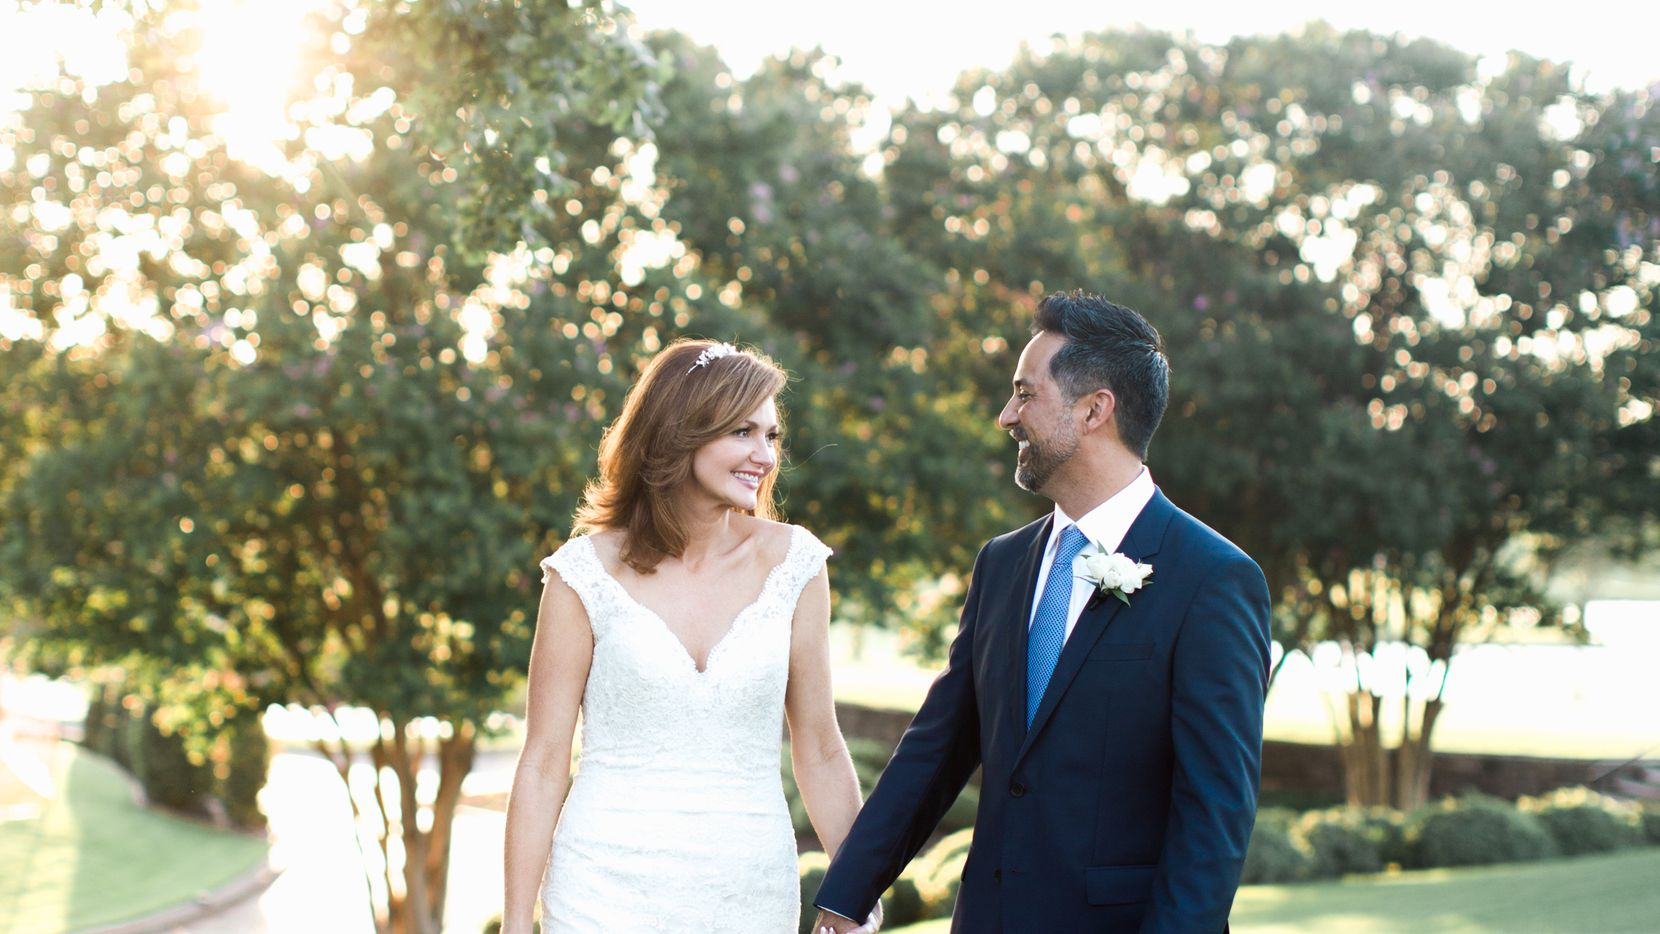 Kellie Rasberry married Allen Evans on July 1.